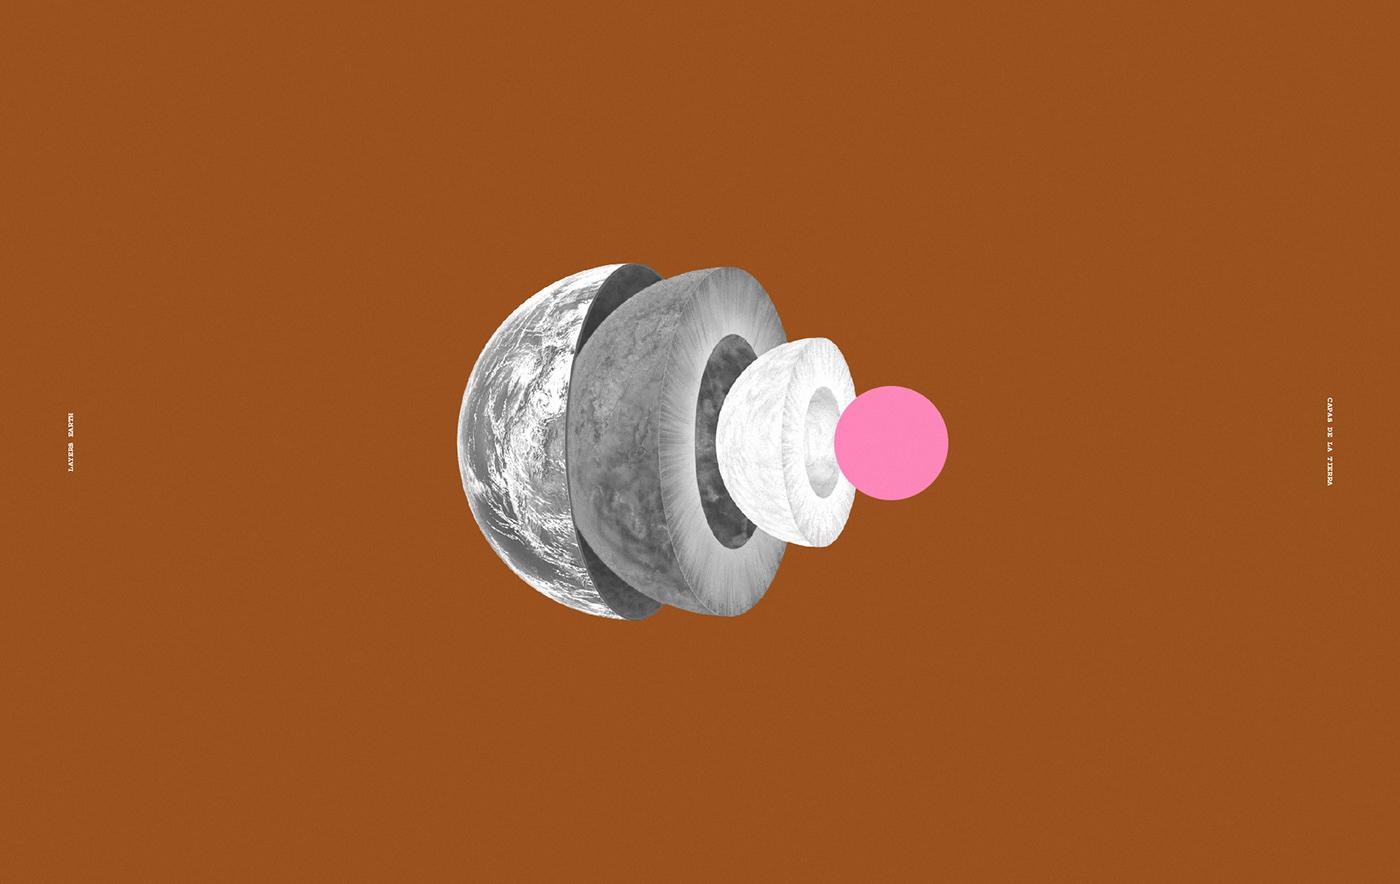 system conceptual minimal lenguage icons elements Soup sustentable body Ecology